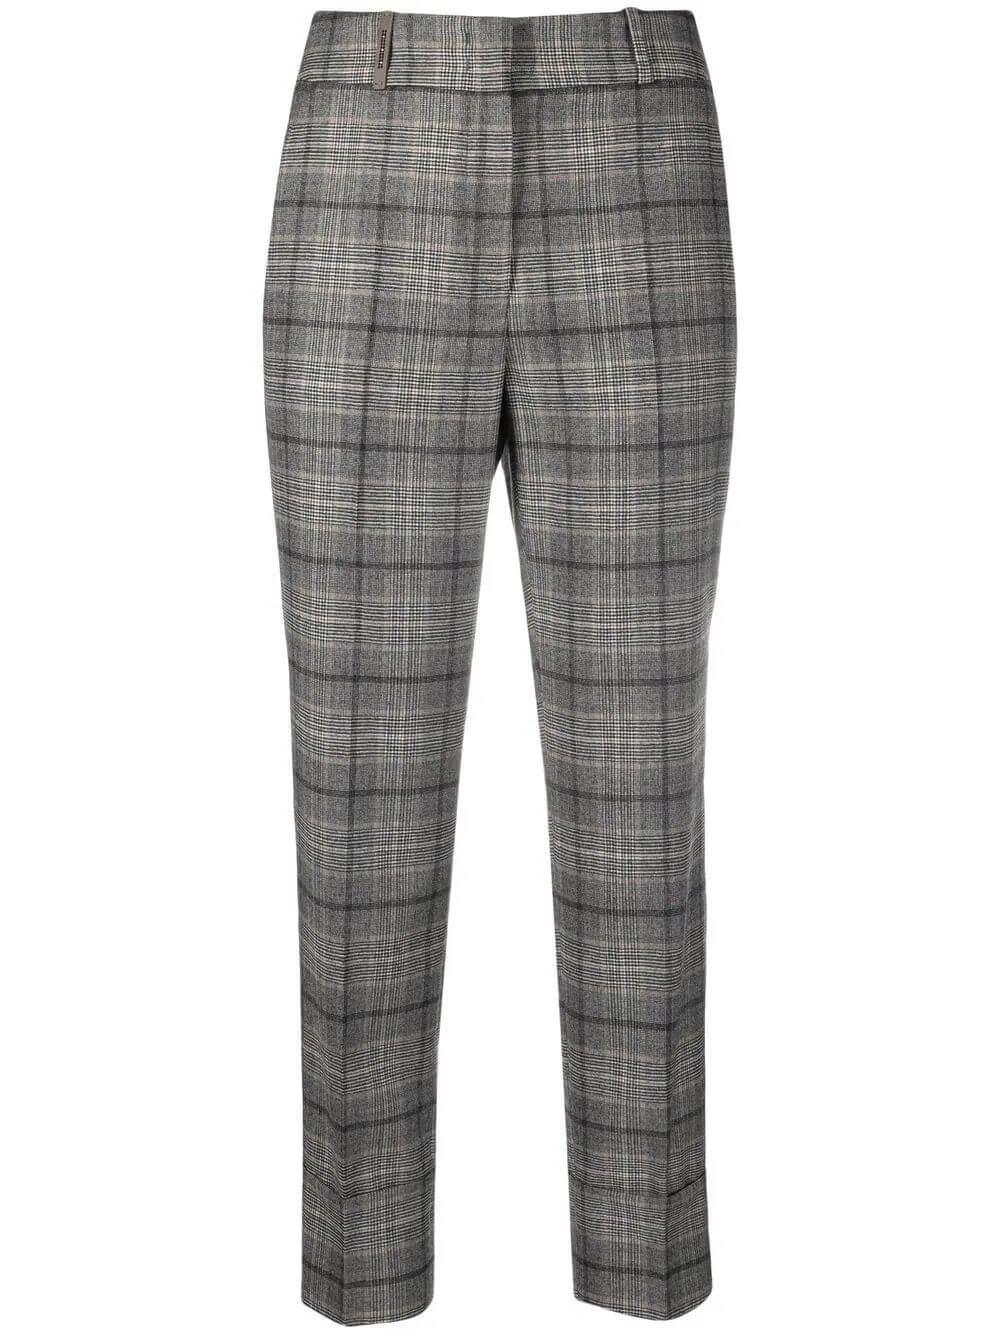 Plaid Wool Flannel Pant Item # P04629